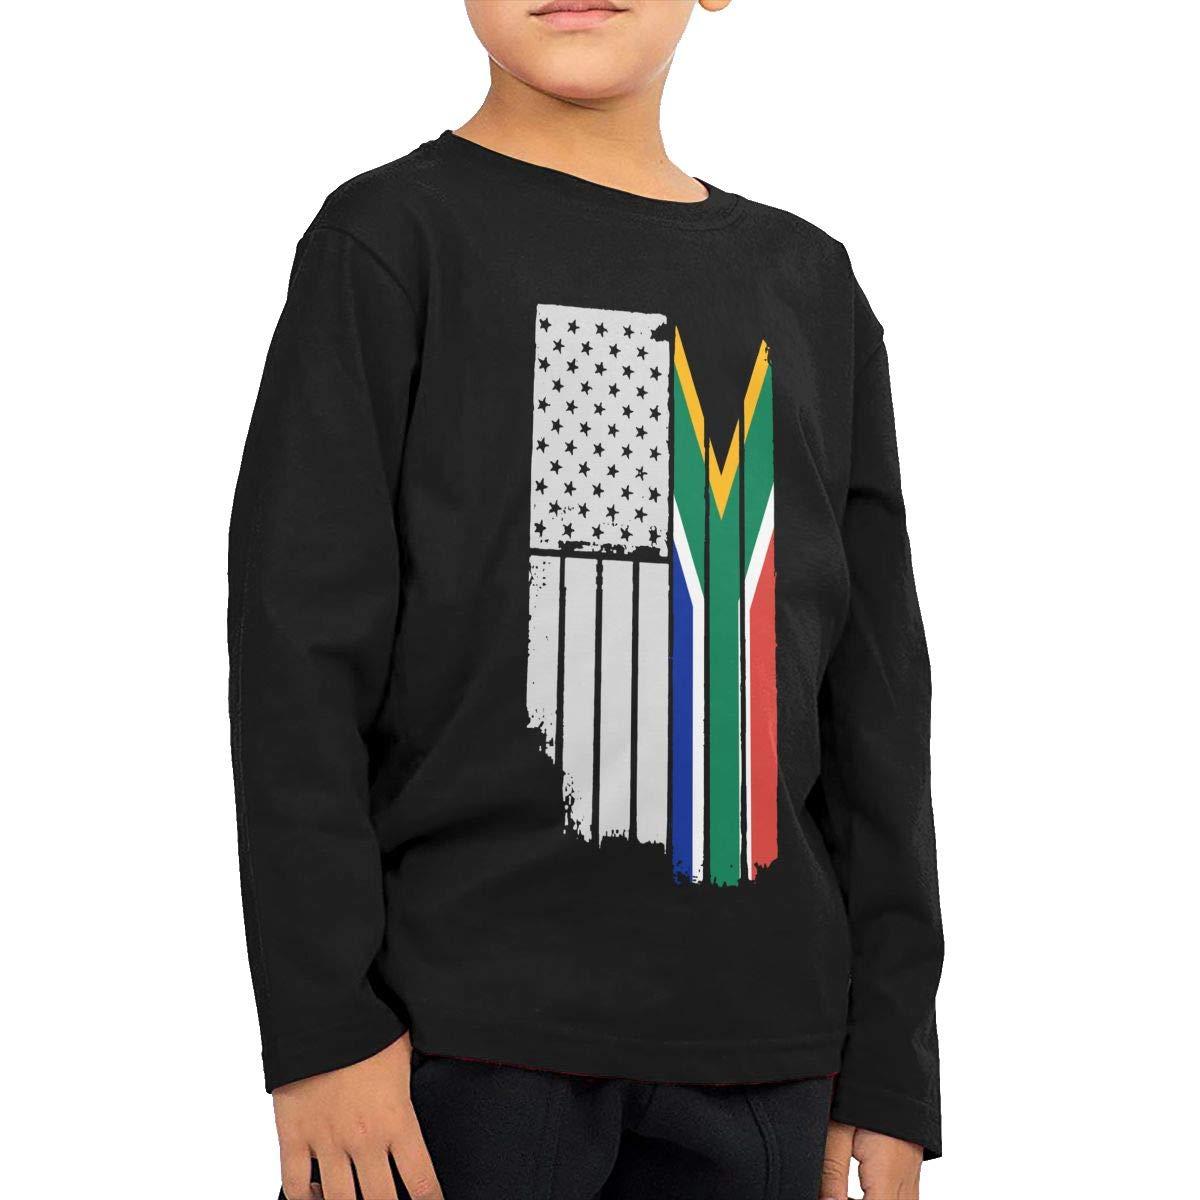 USA Vintage South African Flag Novelty Toddler Kid Baby Boys Girls Long Sleeve Shirt Top/&Tee